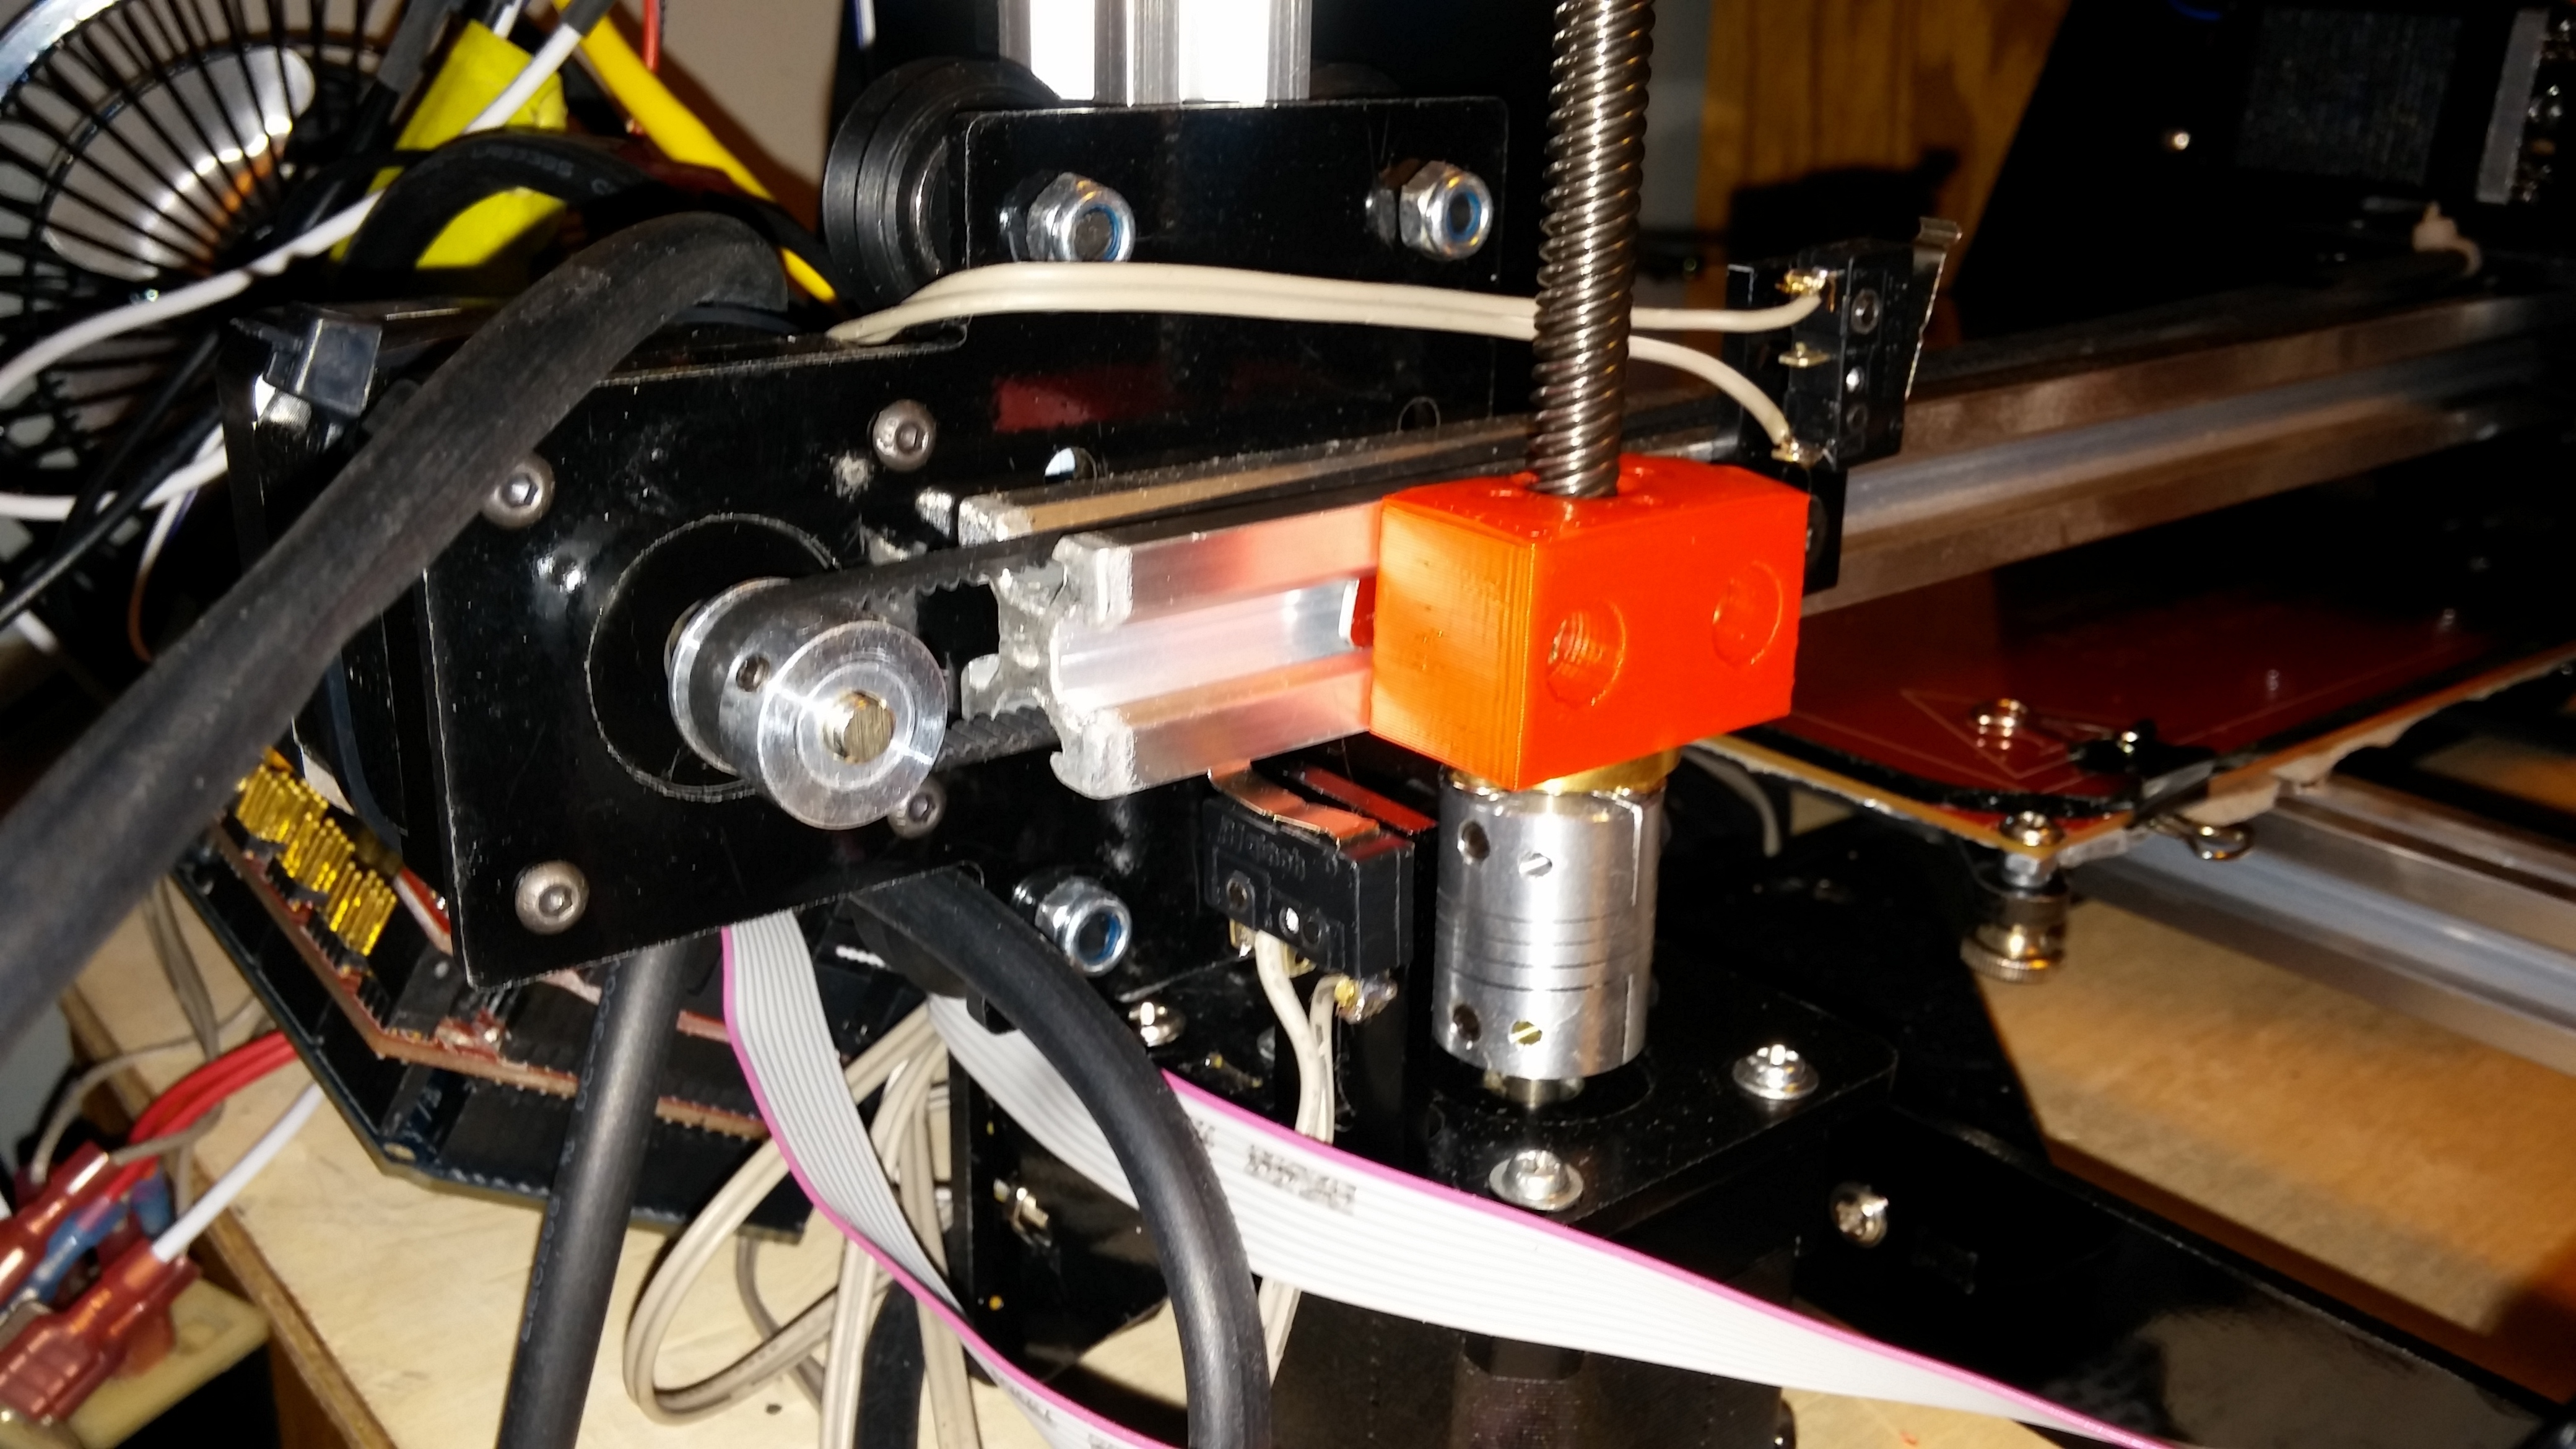 0309151646a.jpg Download free STL file NCS P3-v Steel Brass Lead screw mount • 3D print object, trentjw